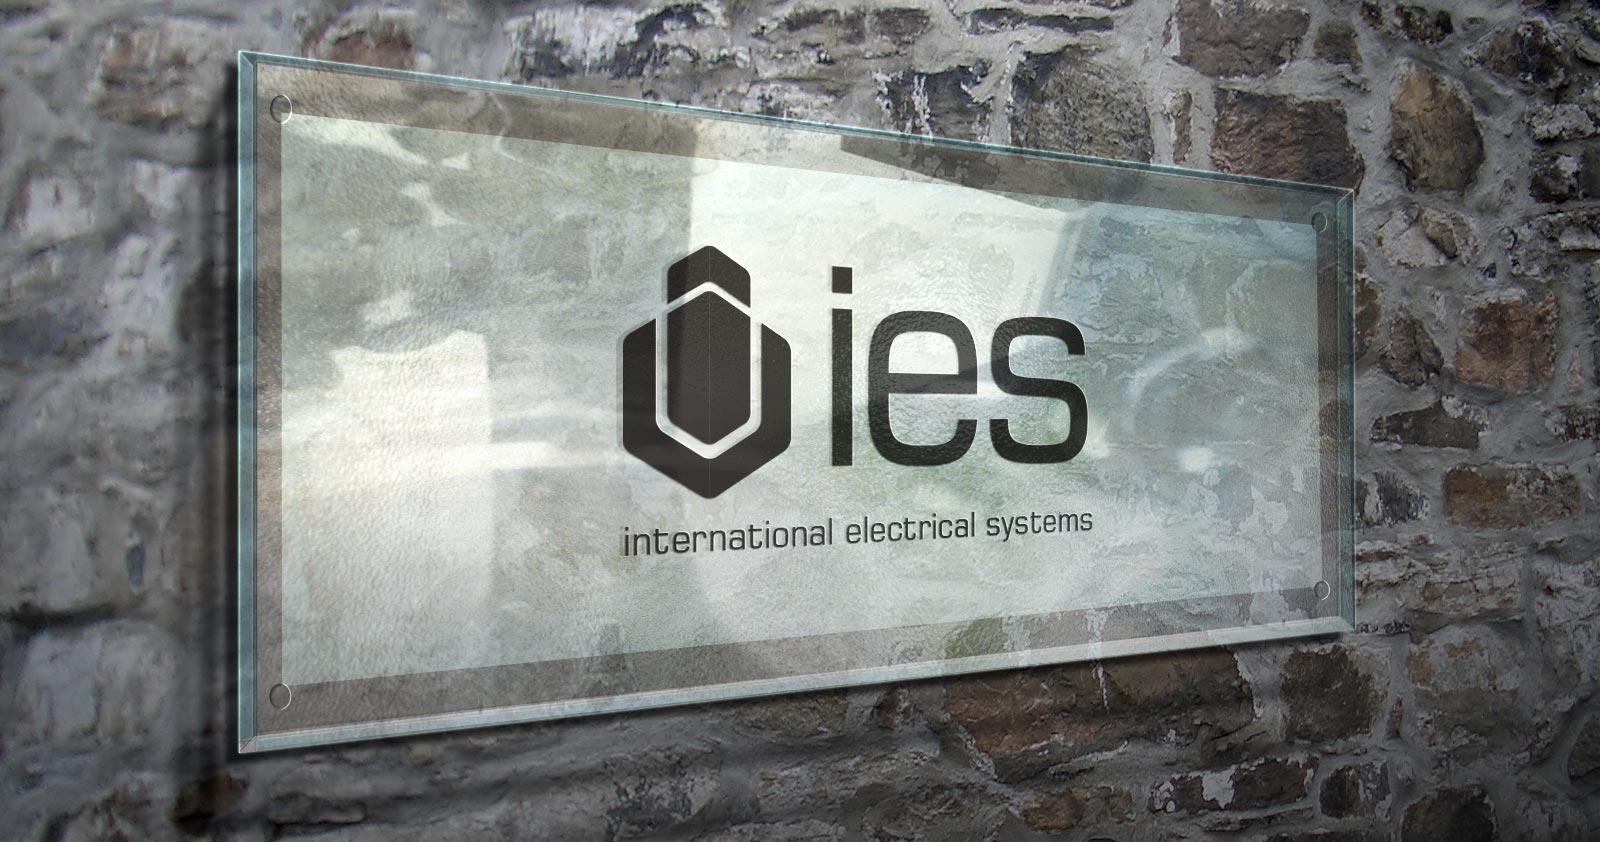 ies logo kurumsal kimlik tasarımı 06